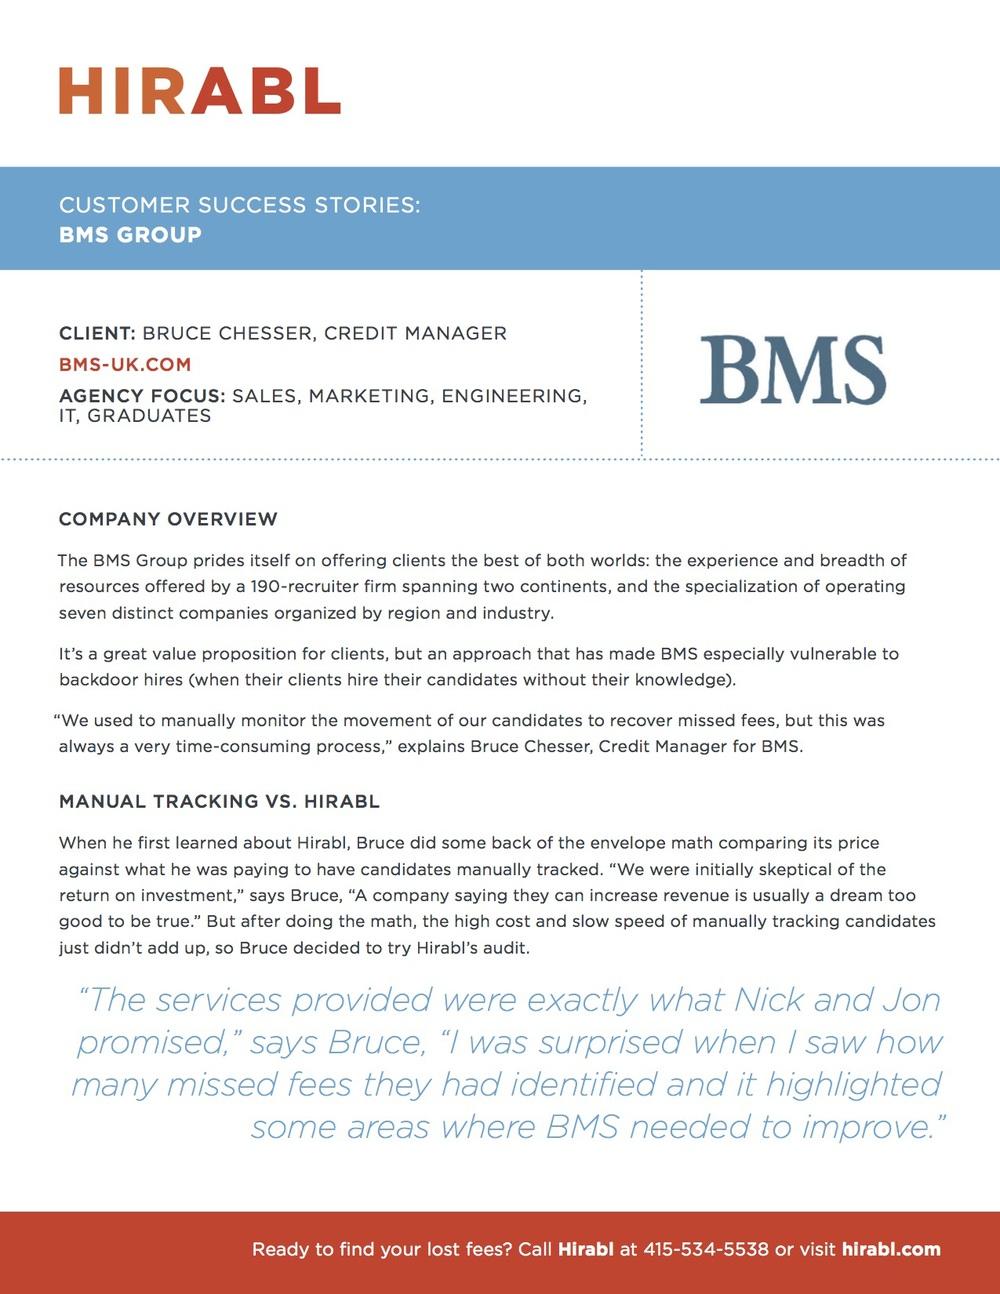 HIRABL Case Study BMS1.jpg